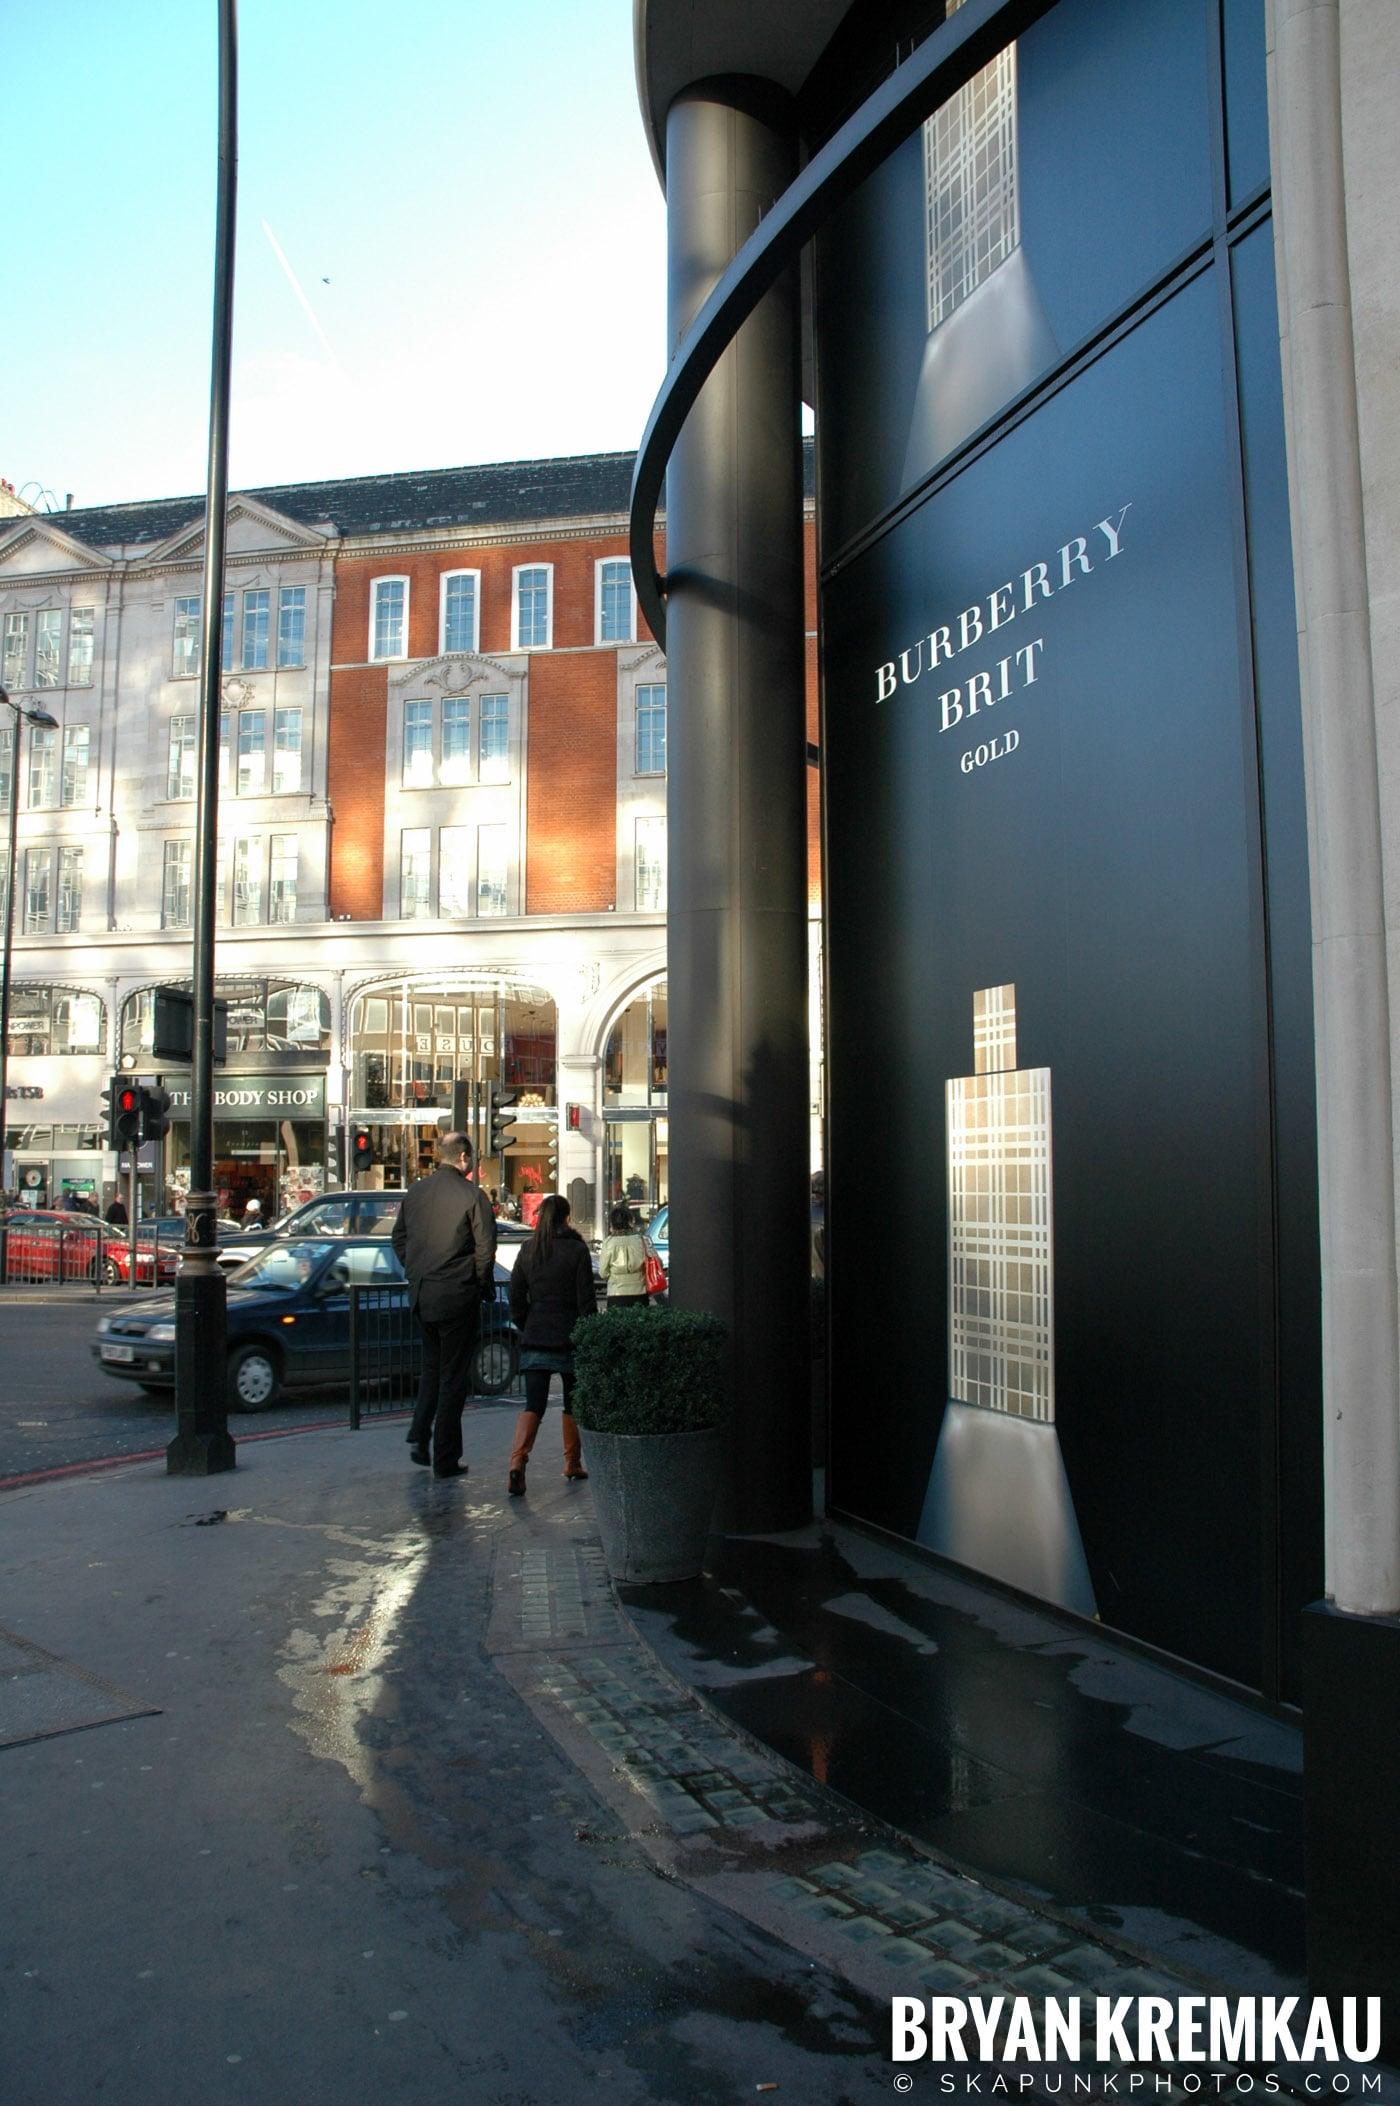 London, England - Day 3 - 12.18.05 (38)